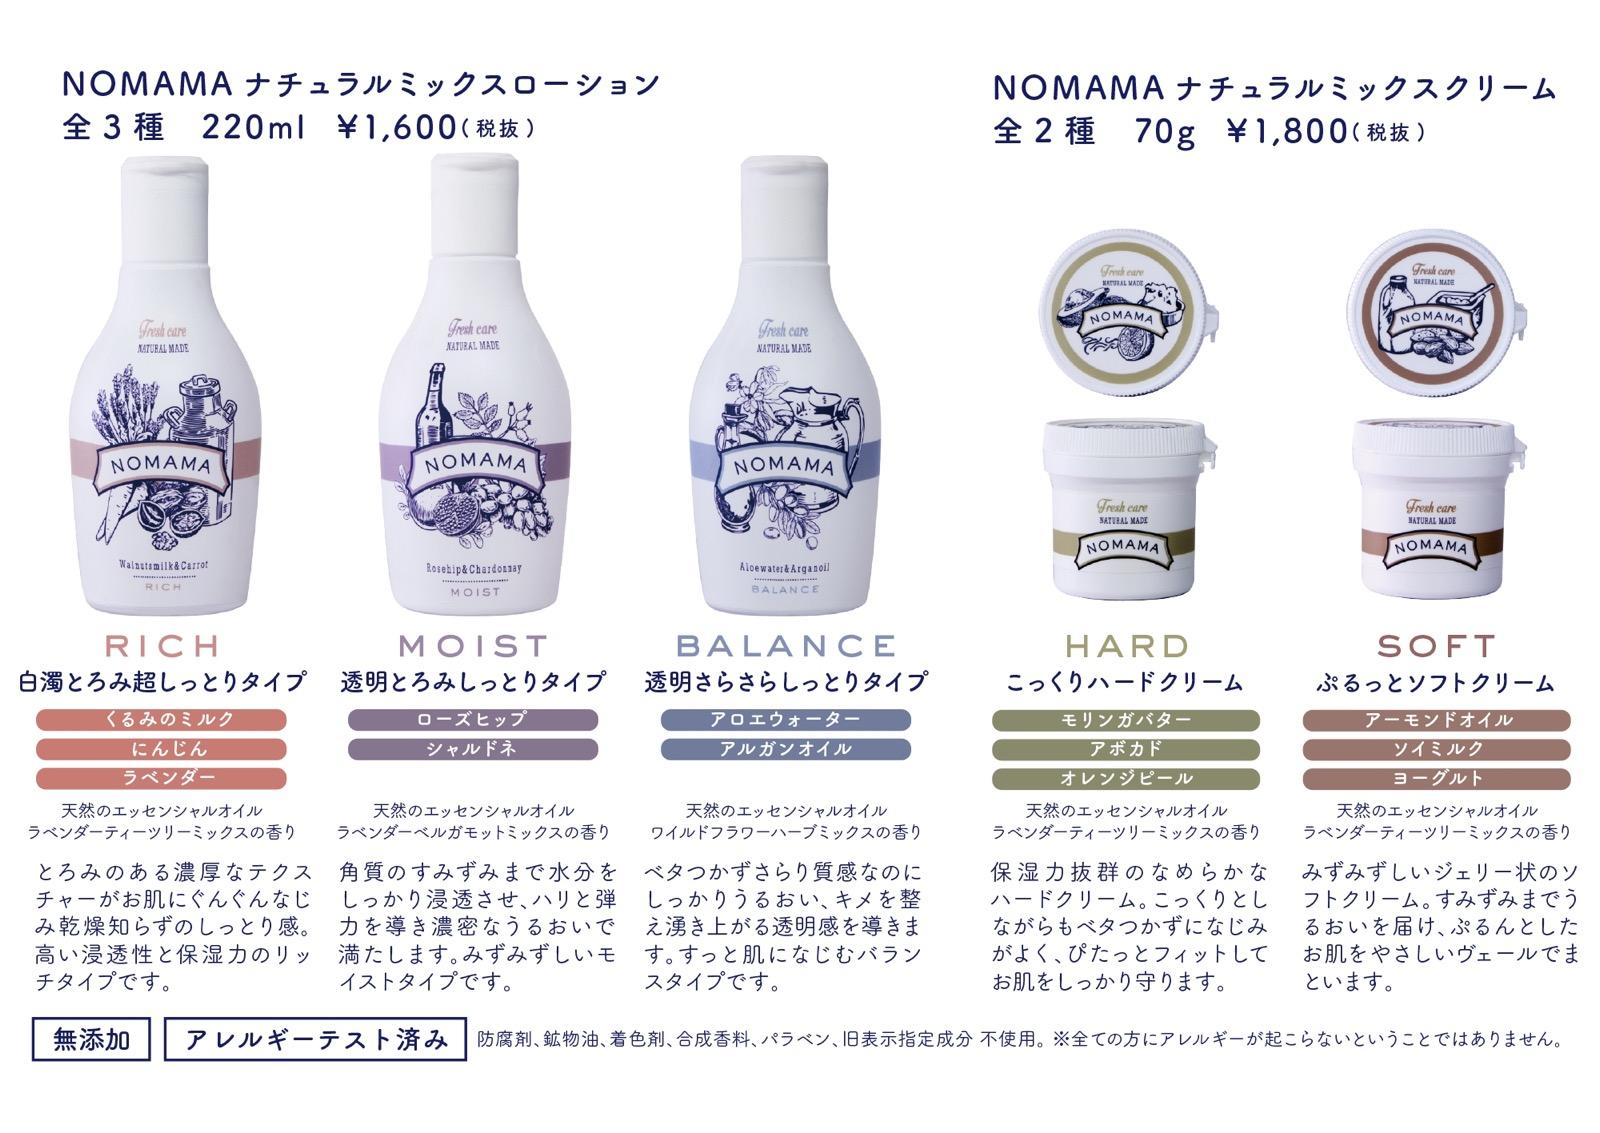 NOMAMA スキンケア ラインアップ